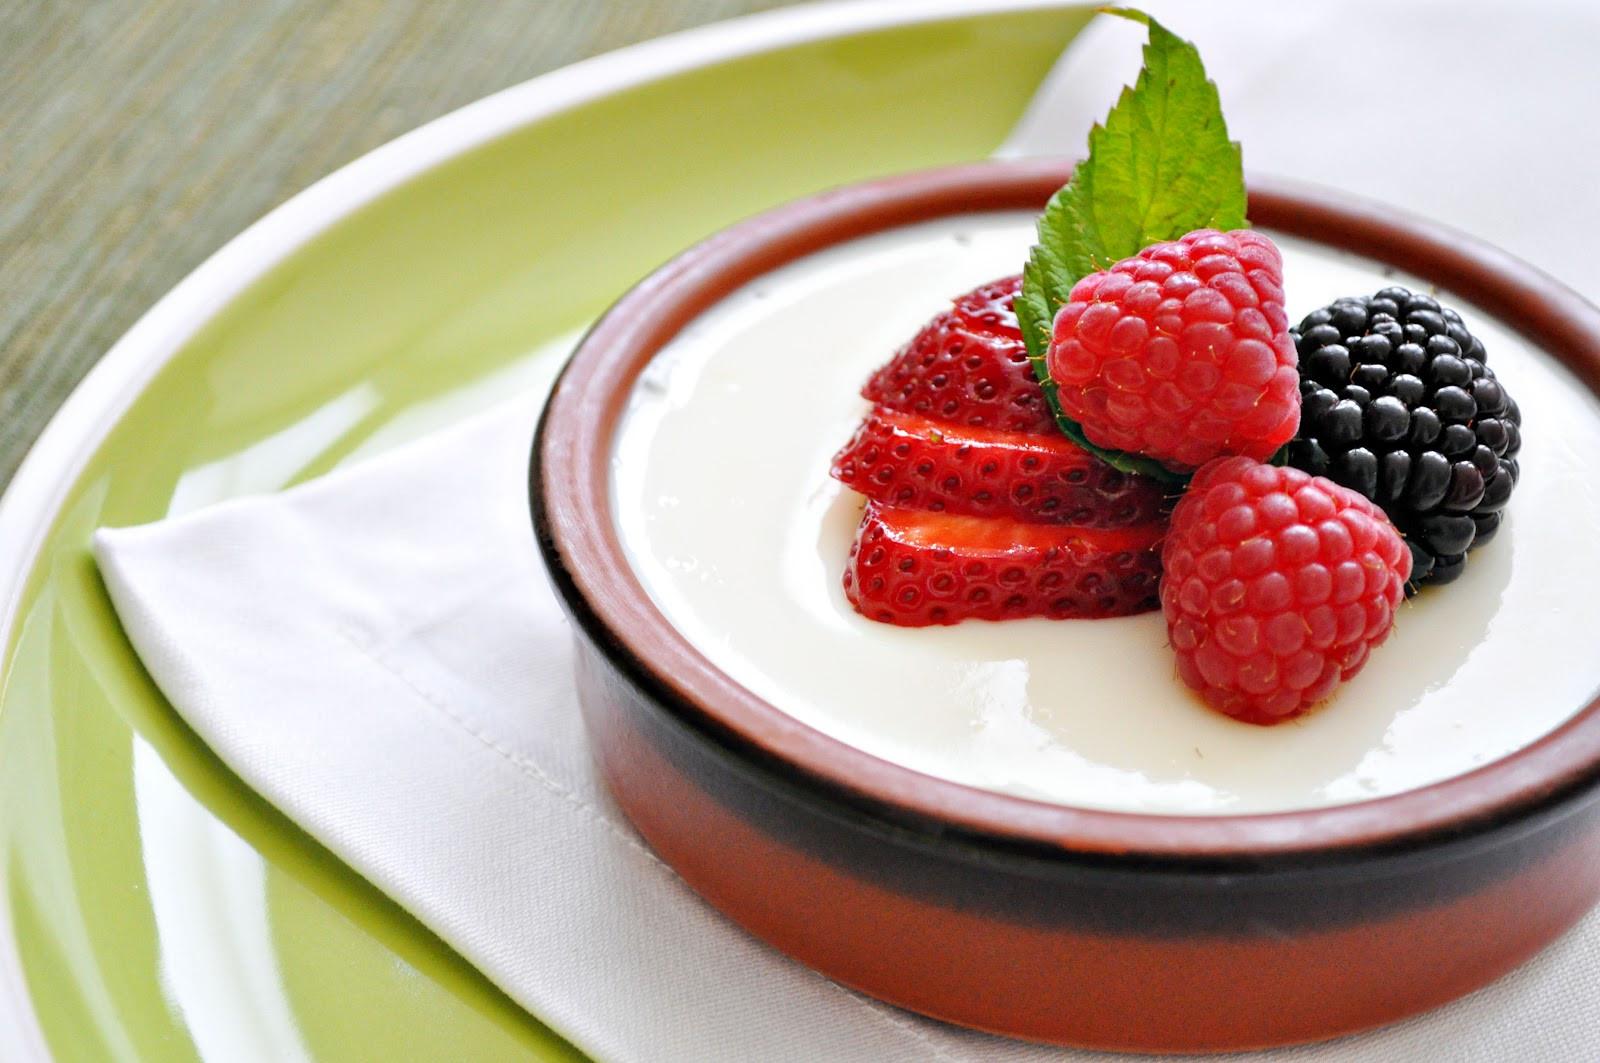 Panna Cotta Desserts  Eat Live Grow Paleo Food Medicine Gelatine for your Skin